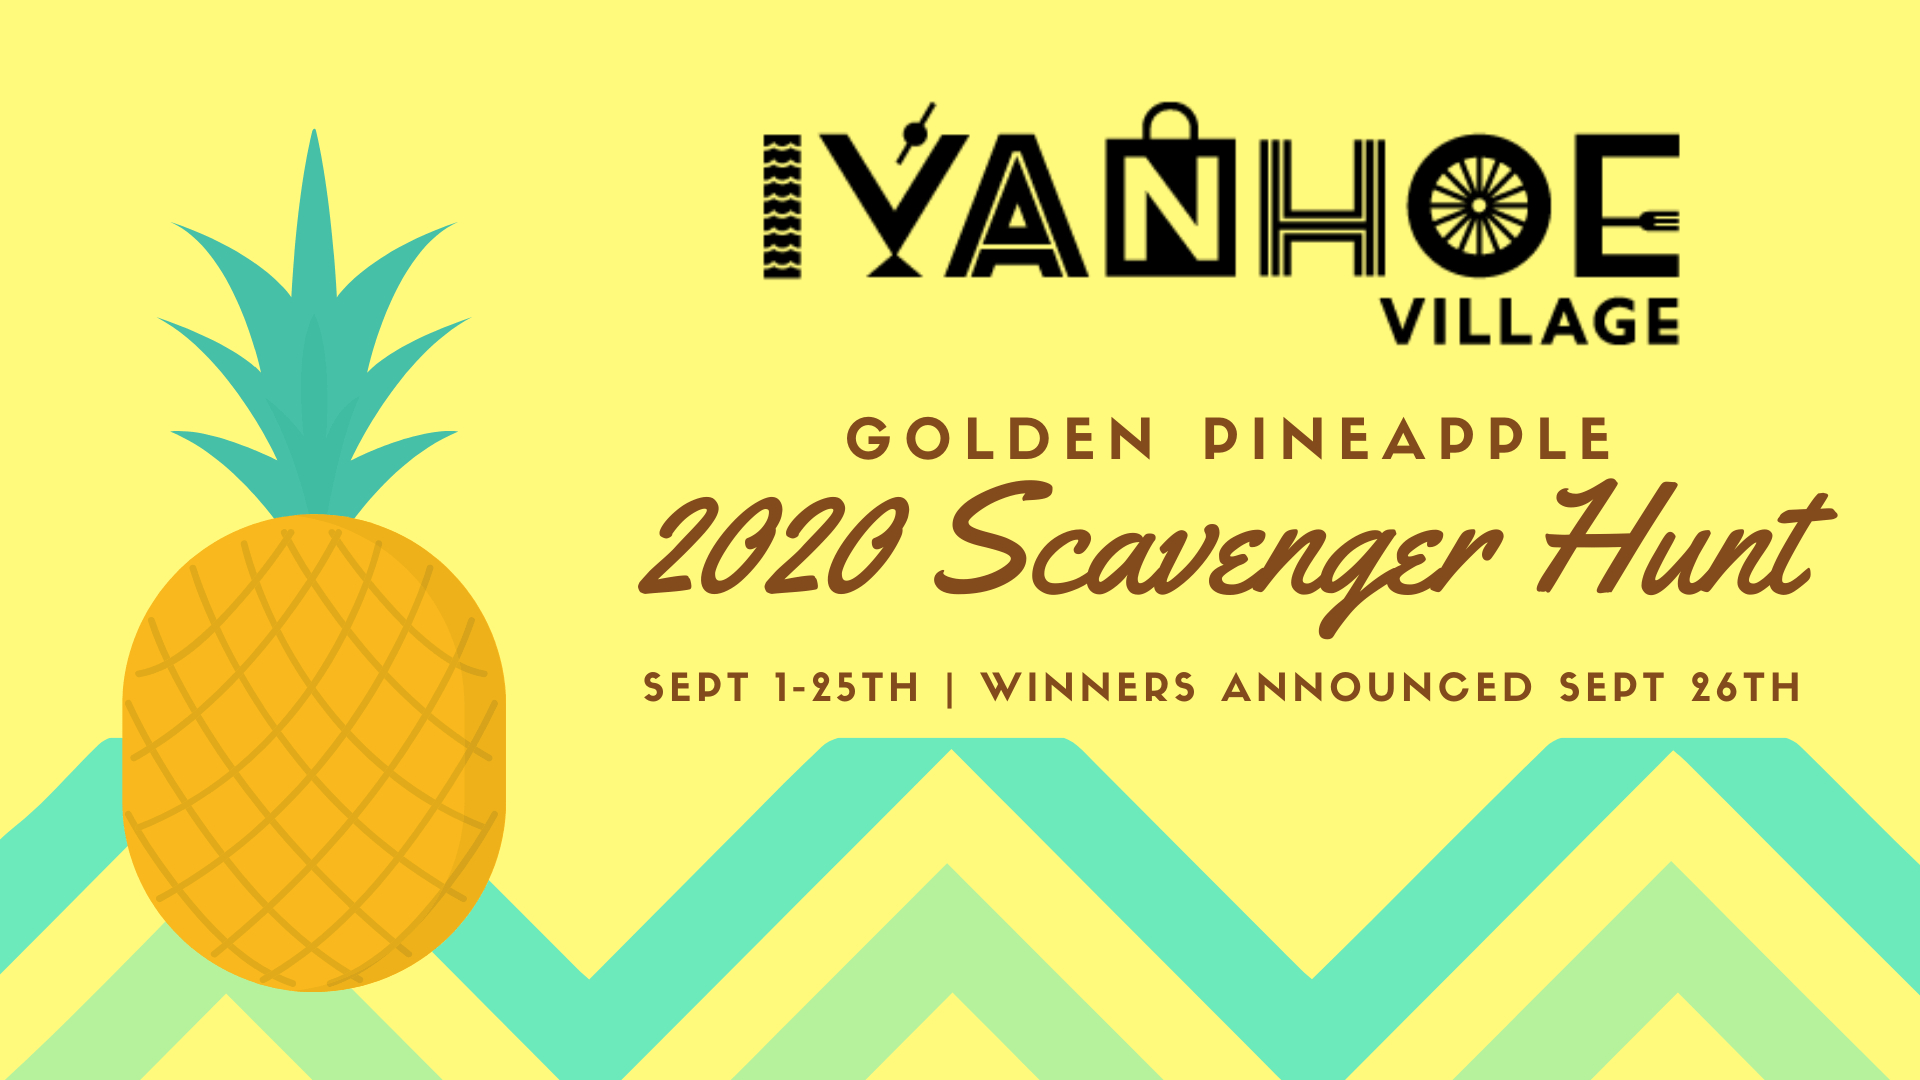 2020 Scavenger Hunt